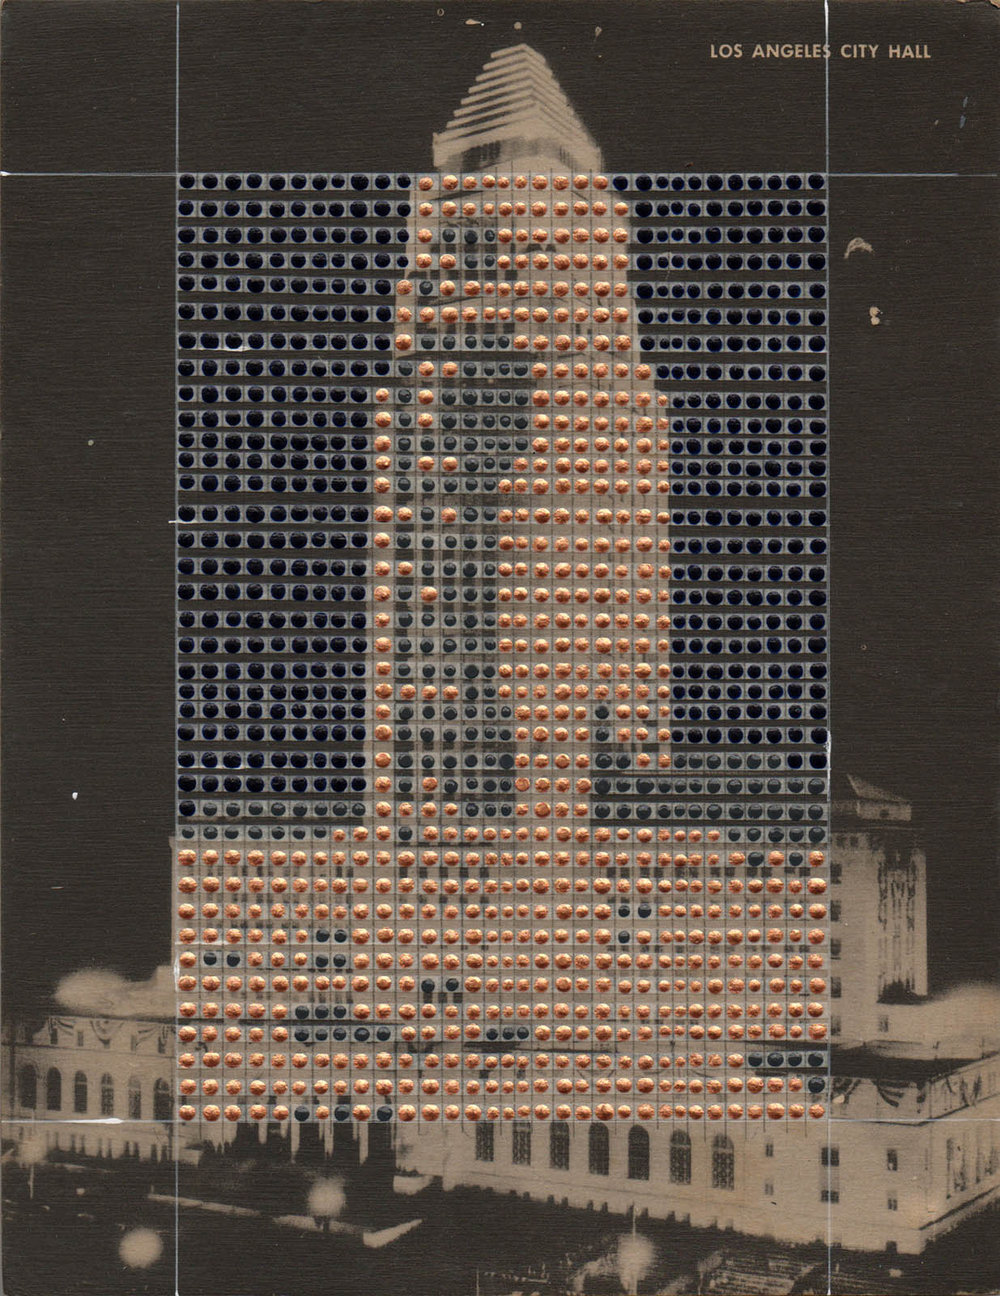 Borrowed Landscapes Study No.128 /California, Los Angeles City Hall